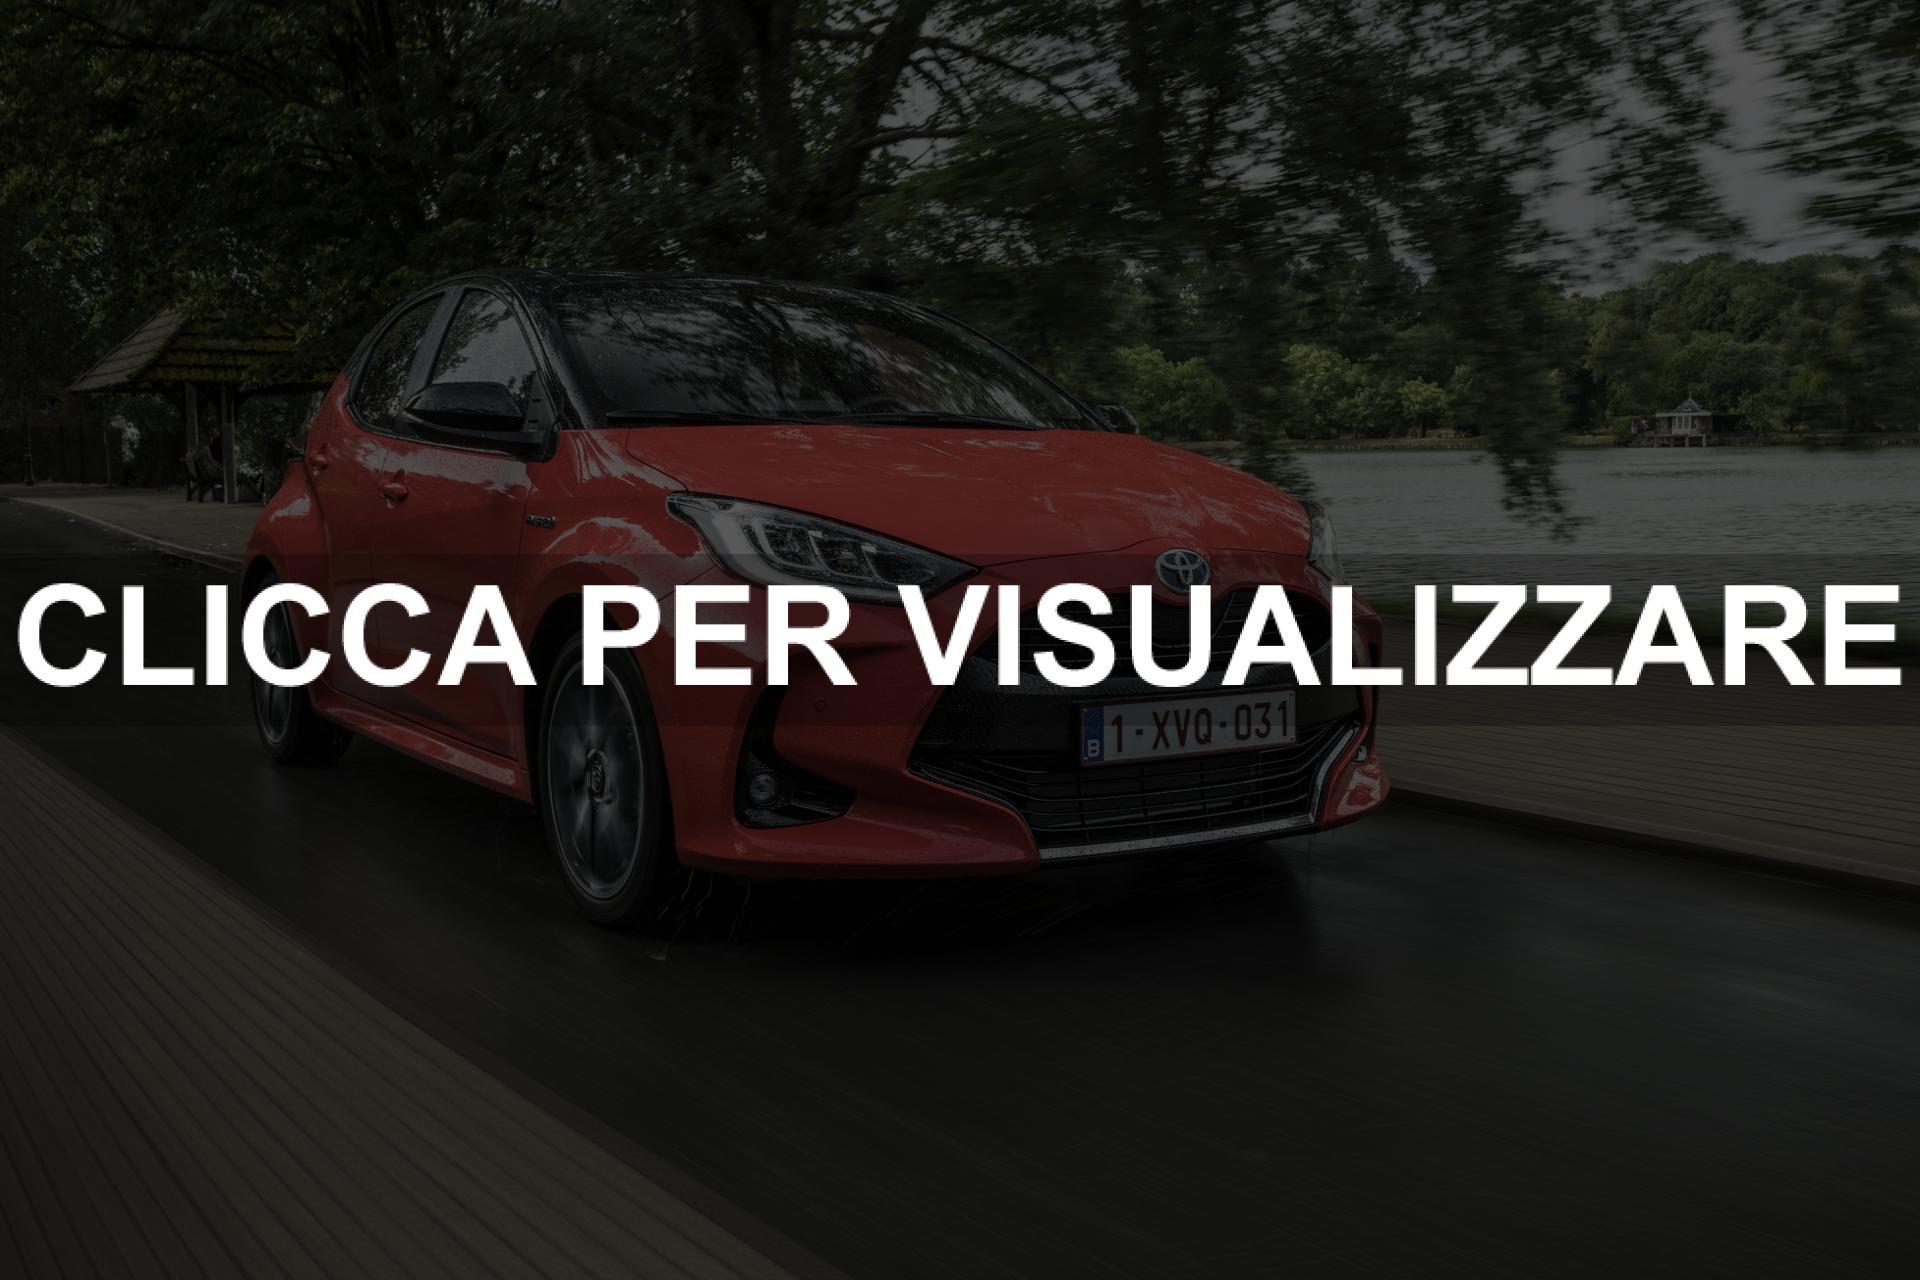 Nuova Toyota Yaris 2020 ibrida da 116 cv